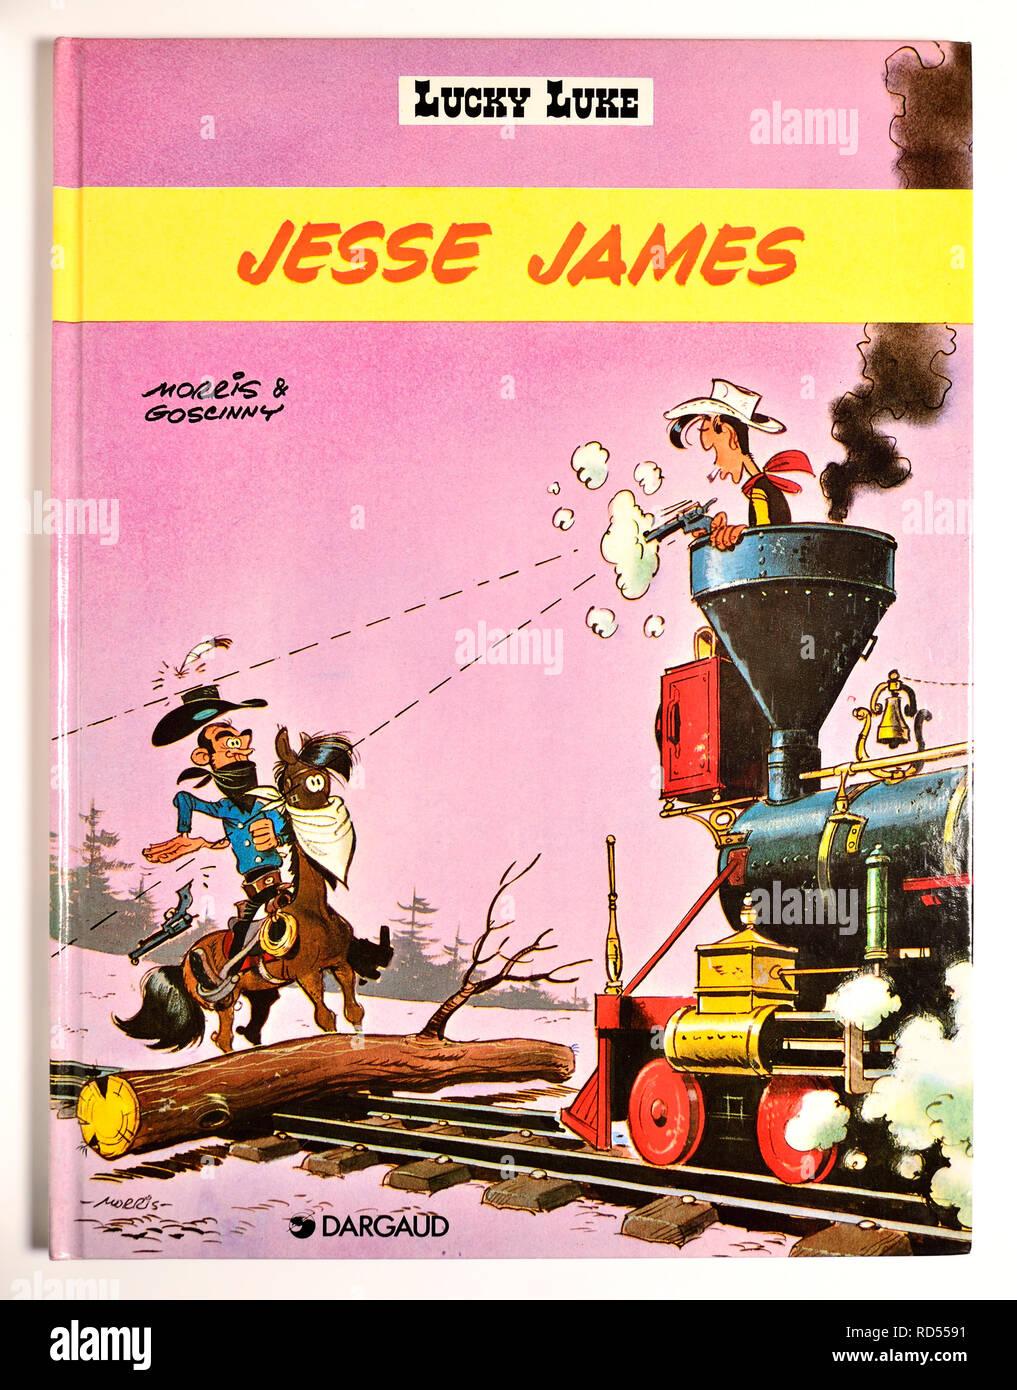 Lucky Luke comic book - Jesse James - Stock Image